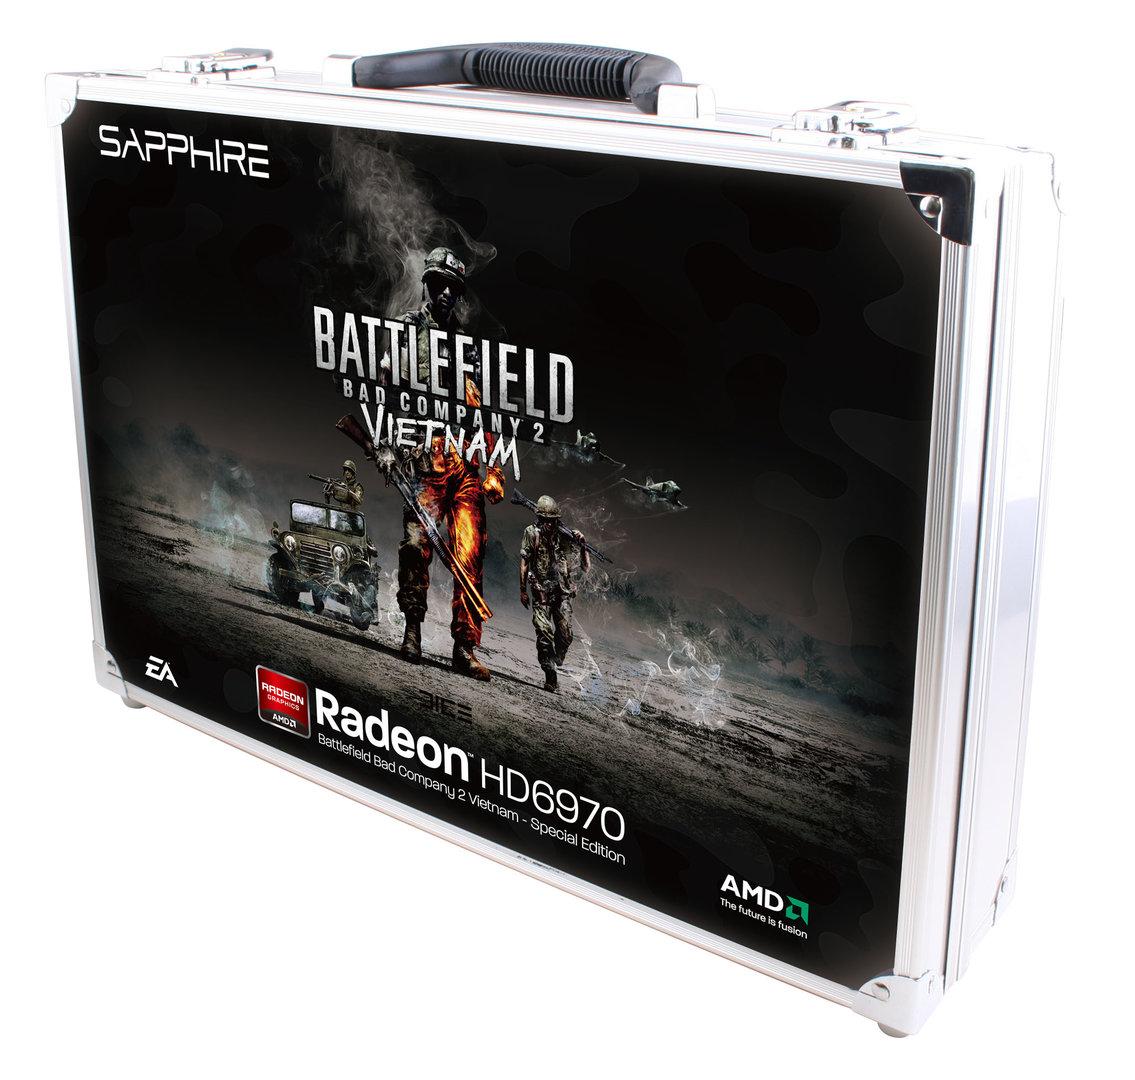 Sapphire Radeon HD 6970 BFBC2 Vietnam Special Edition im Alu-Koffer